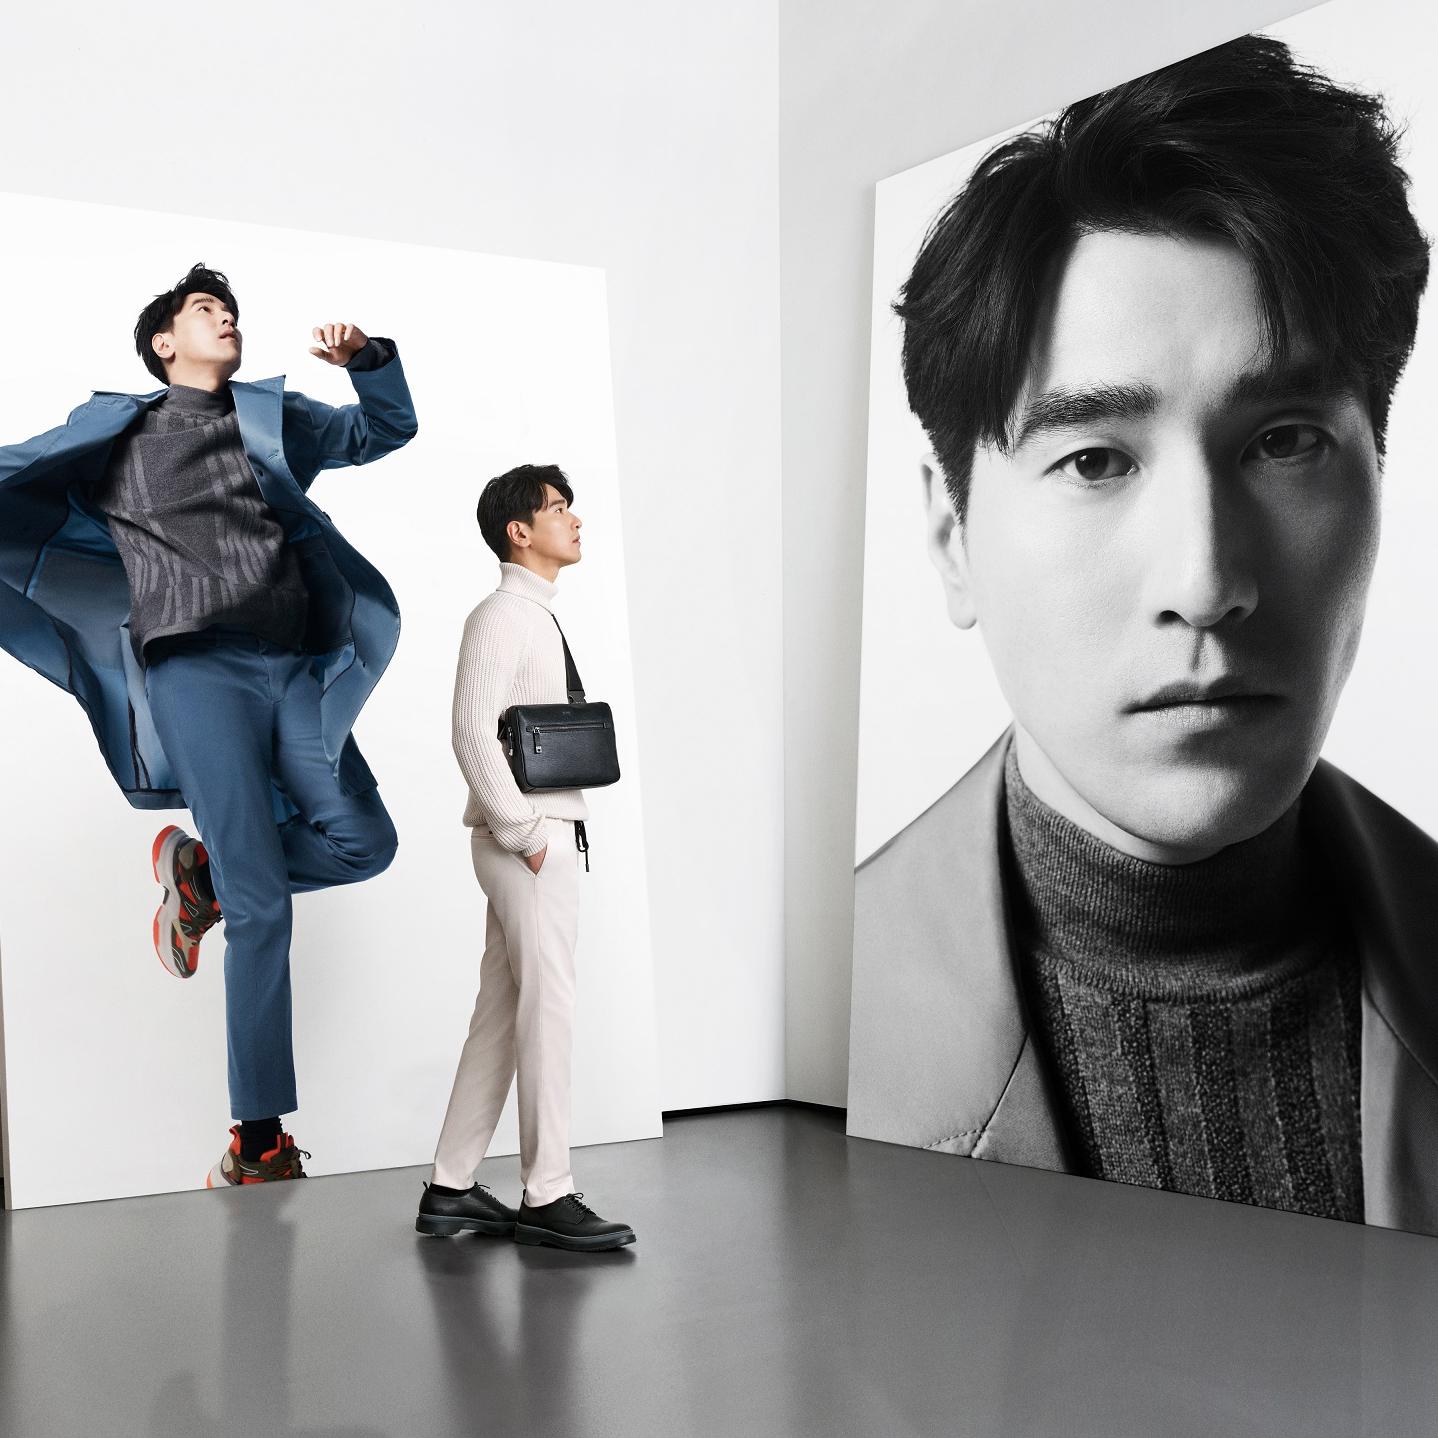 <p>BOSS 大中華區品牌代言人趙又廷演繹 2019 秋冬廣告企劃!</p>